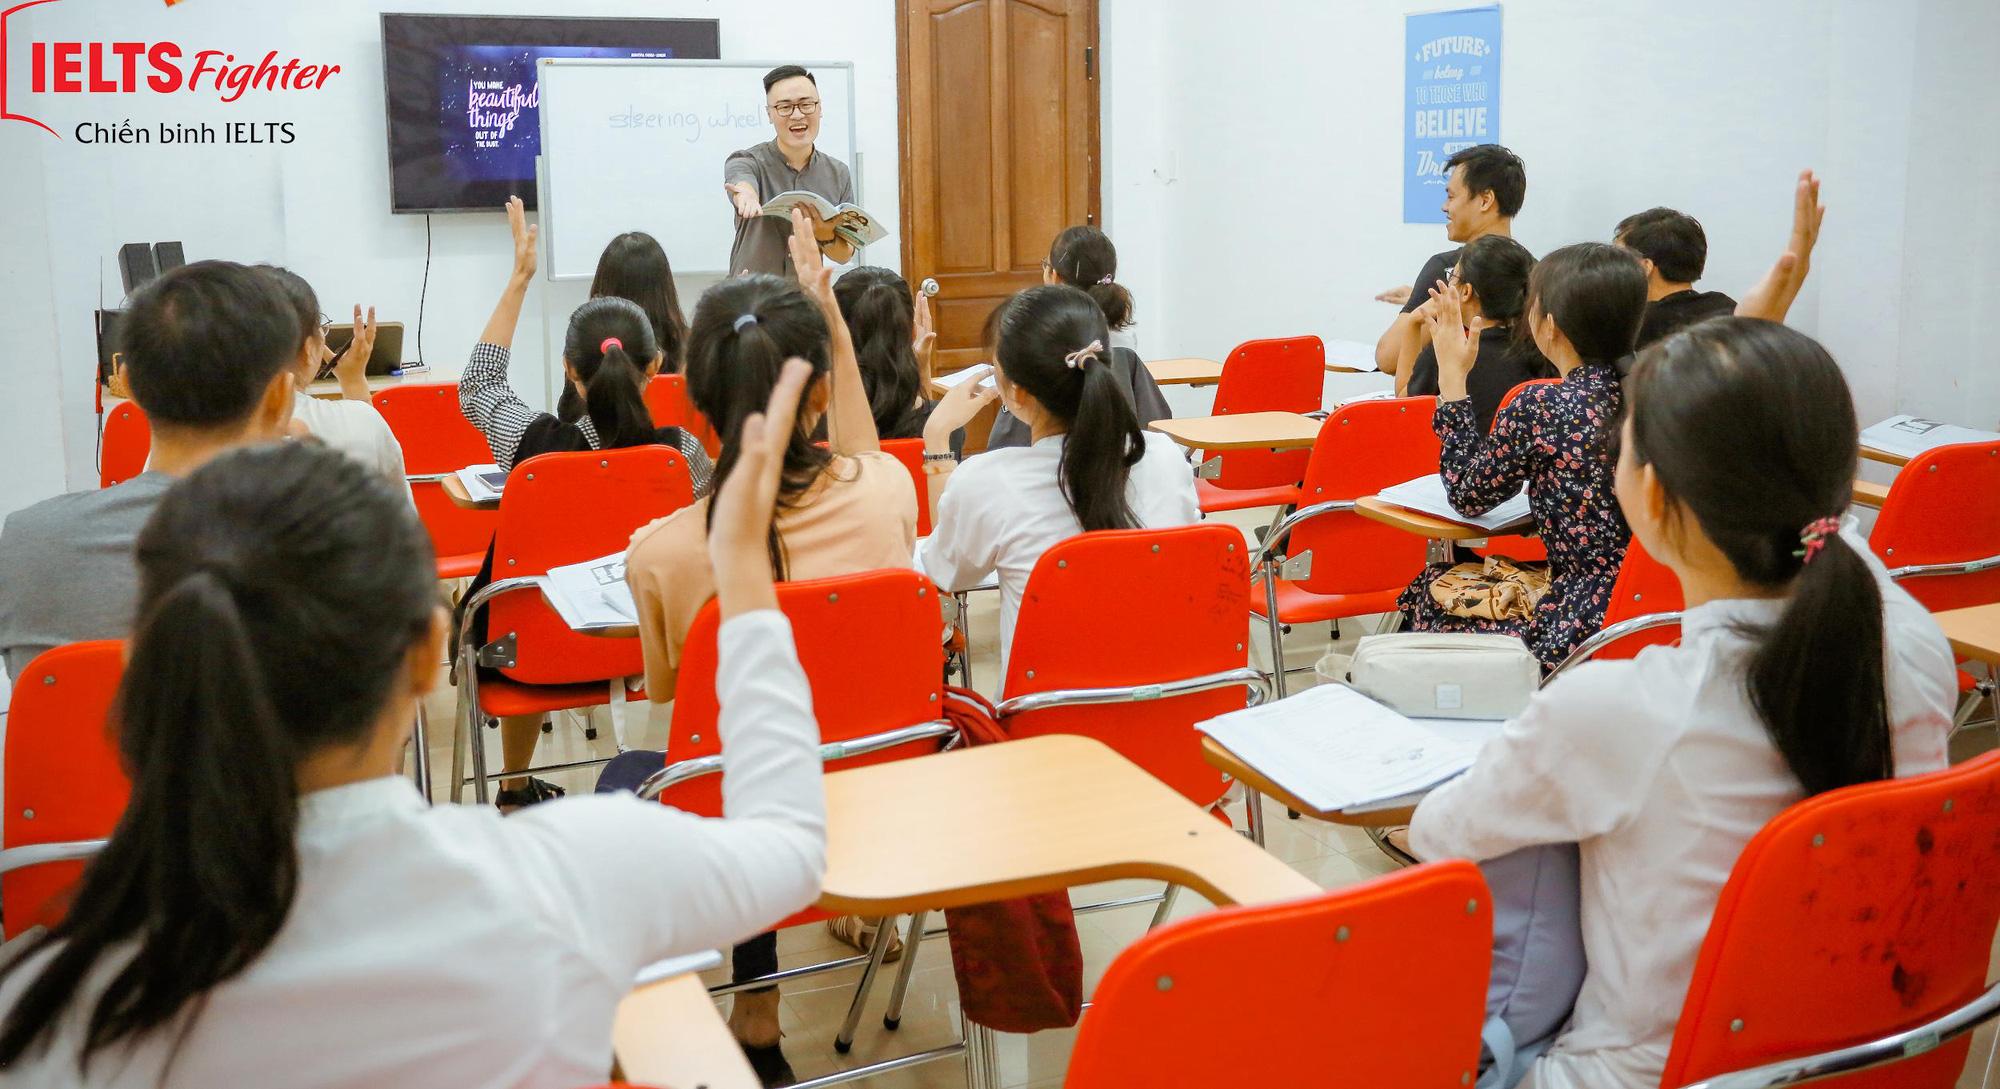 IELTS Fighter: Trung tâm học IELTS hàng đầu tại Hà Nội